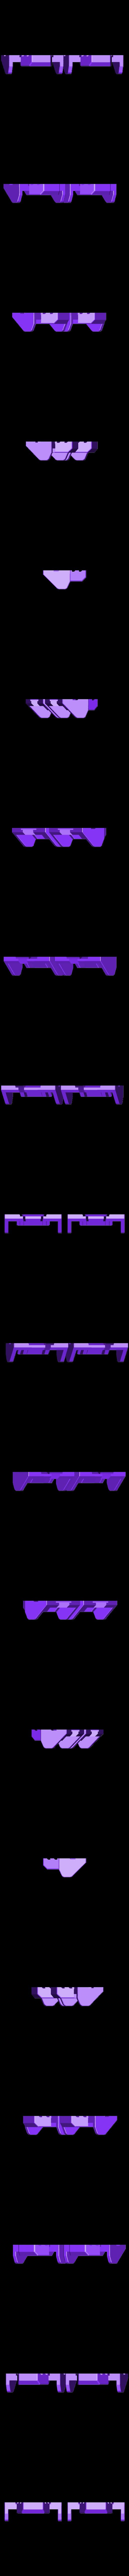 67_Drag_Leg17_FootBottom_BLACK.stl Download STL file ARTICULATED DRAGONLORD (not Dragonzord) - NO SUPPORT • 3D printer model, Toymakr3D